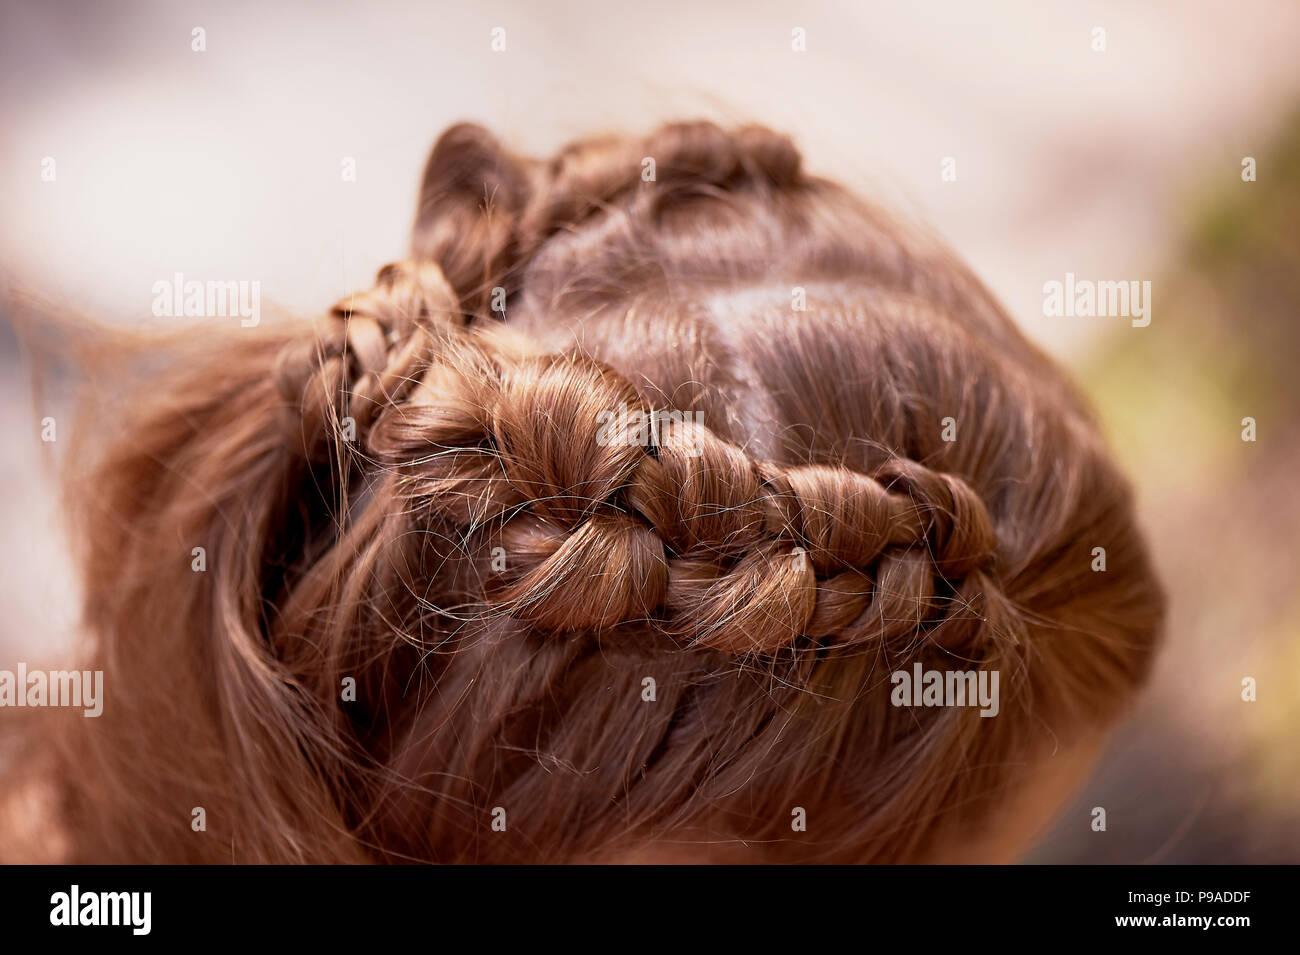 Hochzeit Frisuren Fur Dicke Rote Haare Haar In Der Nahe Stockfoto